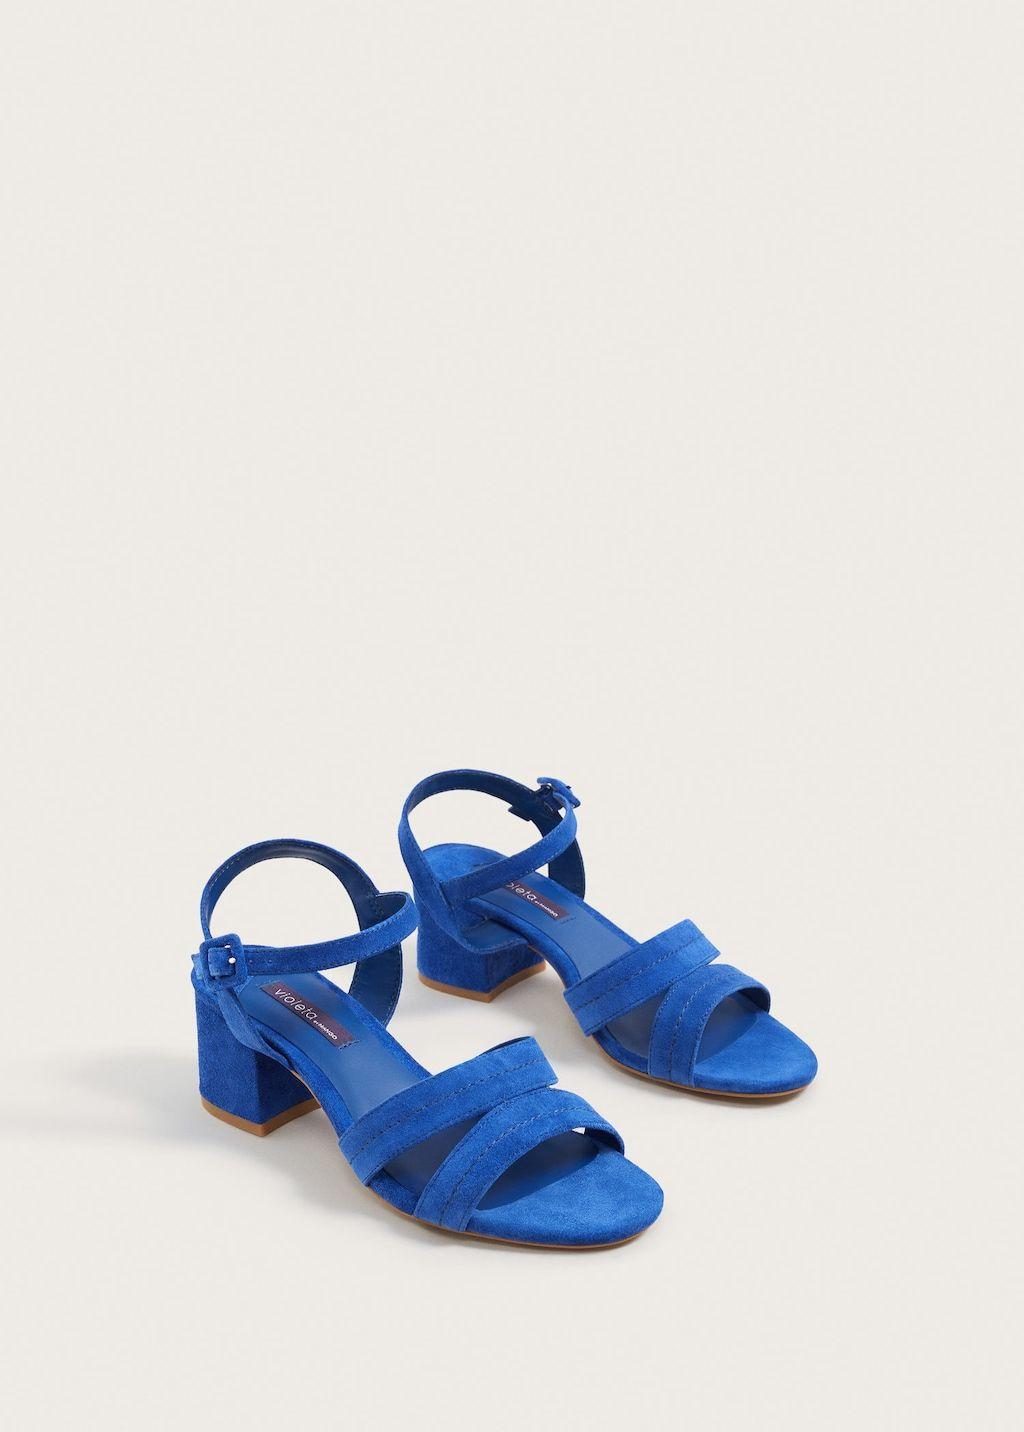 Sandalia Piel Mi En Tallas 2019 Zapatos Grandes Tiras rr0pxd